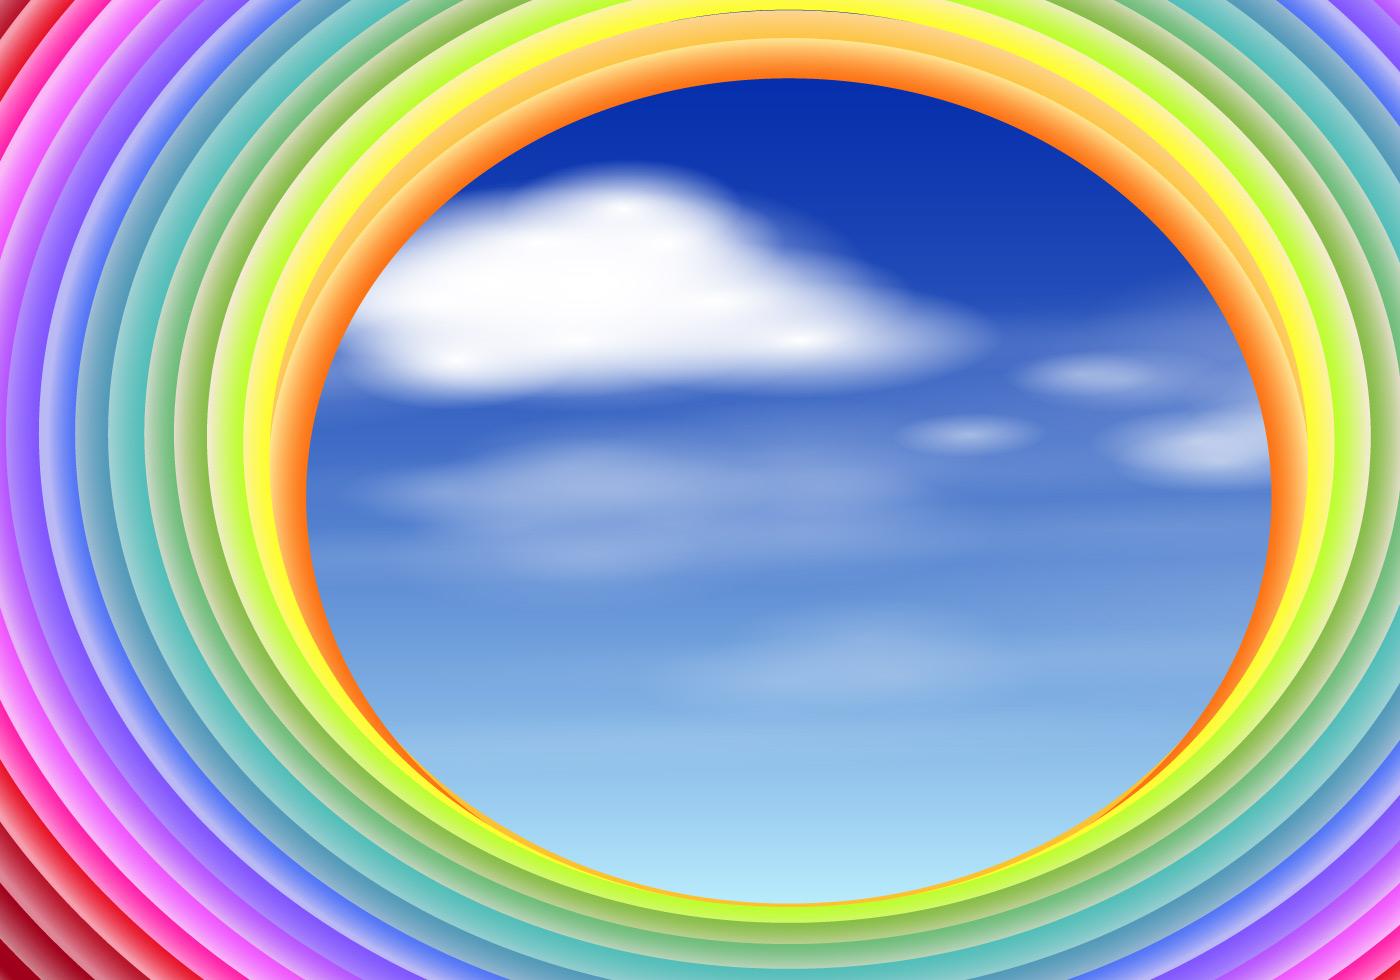 Vector Rainbow Slinky With Sky Scene Illustration Black Circle Vectors Photos And